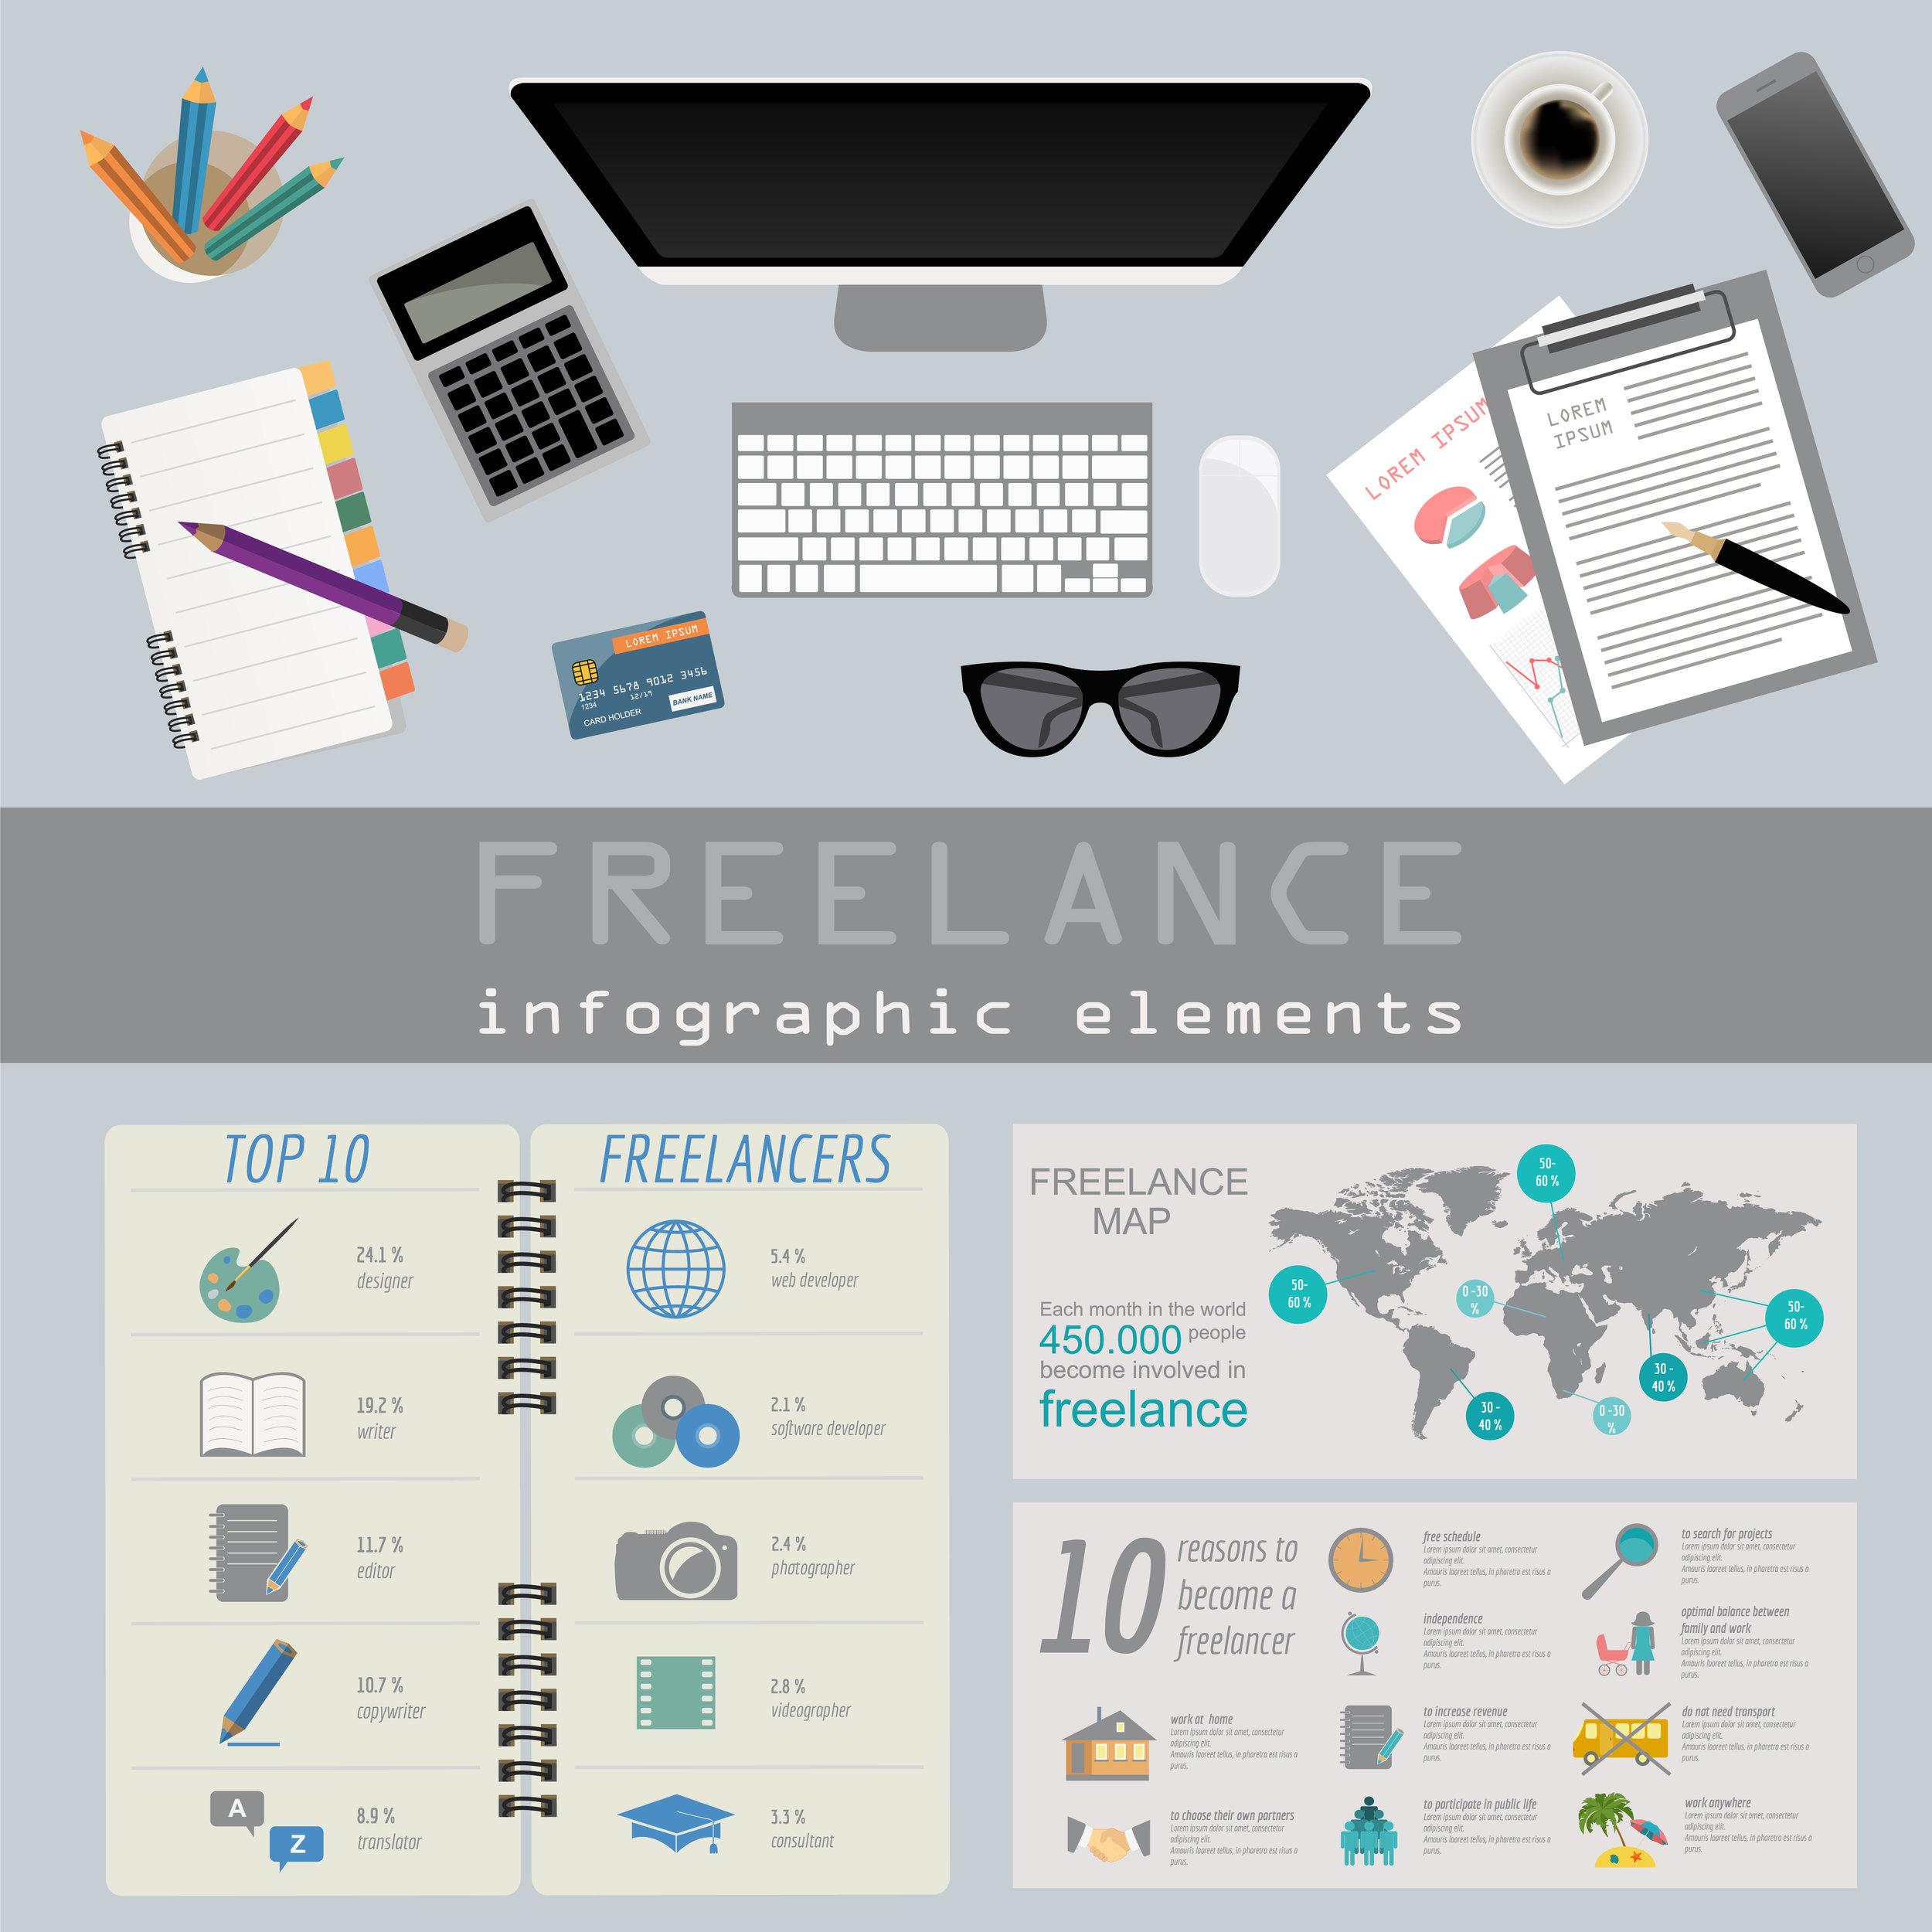 Freelance Writing Statistics